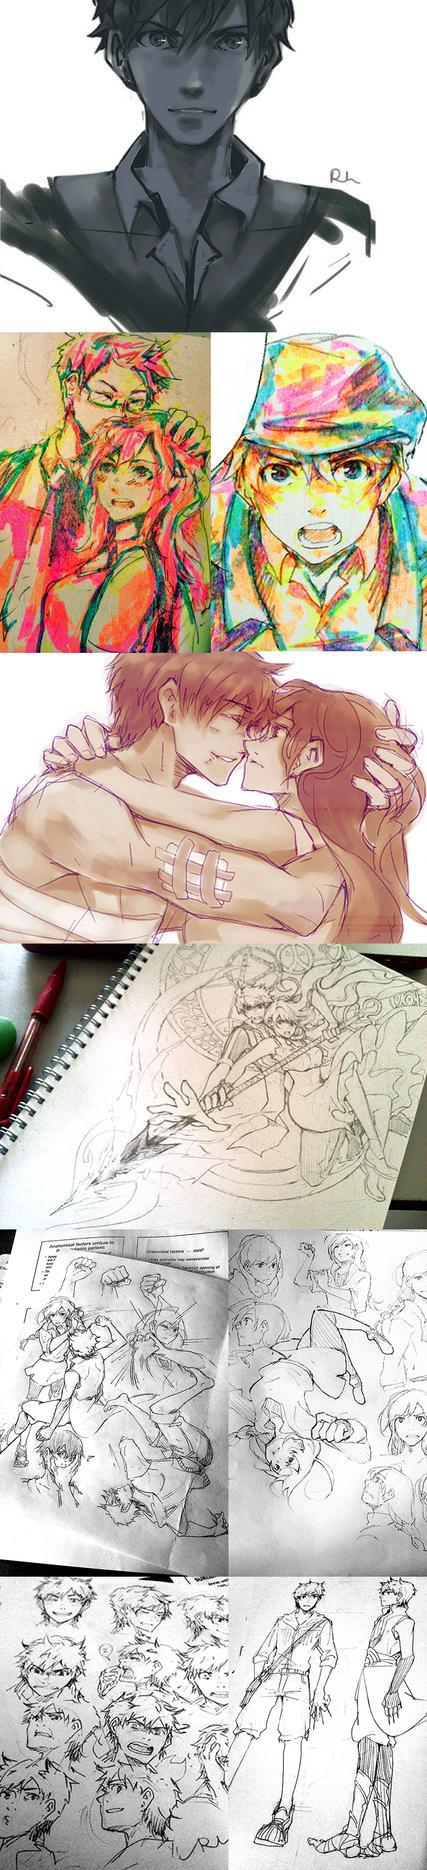 sketch log by pchaness